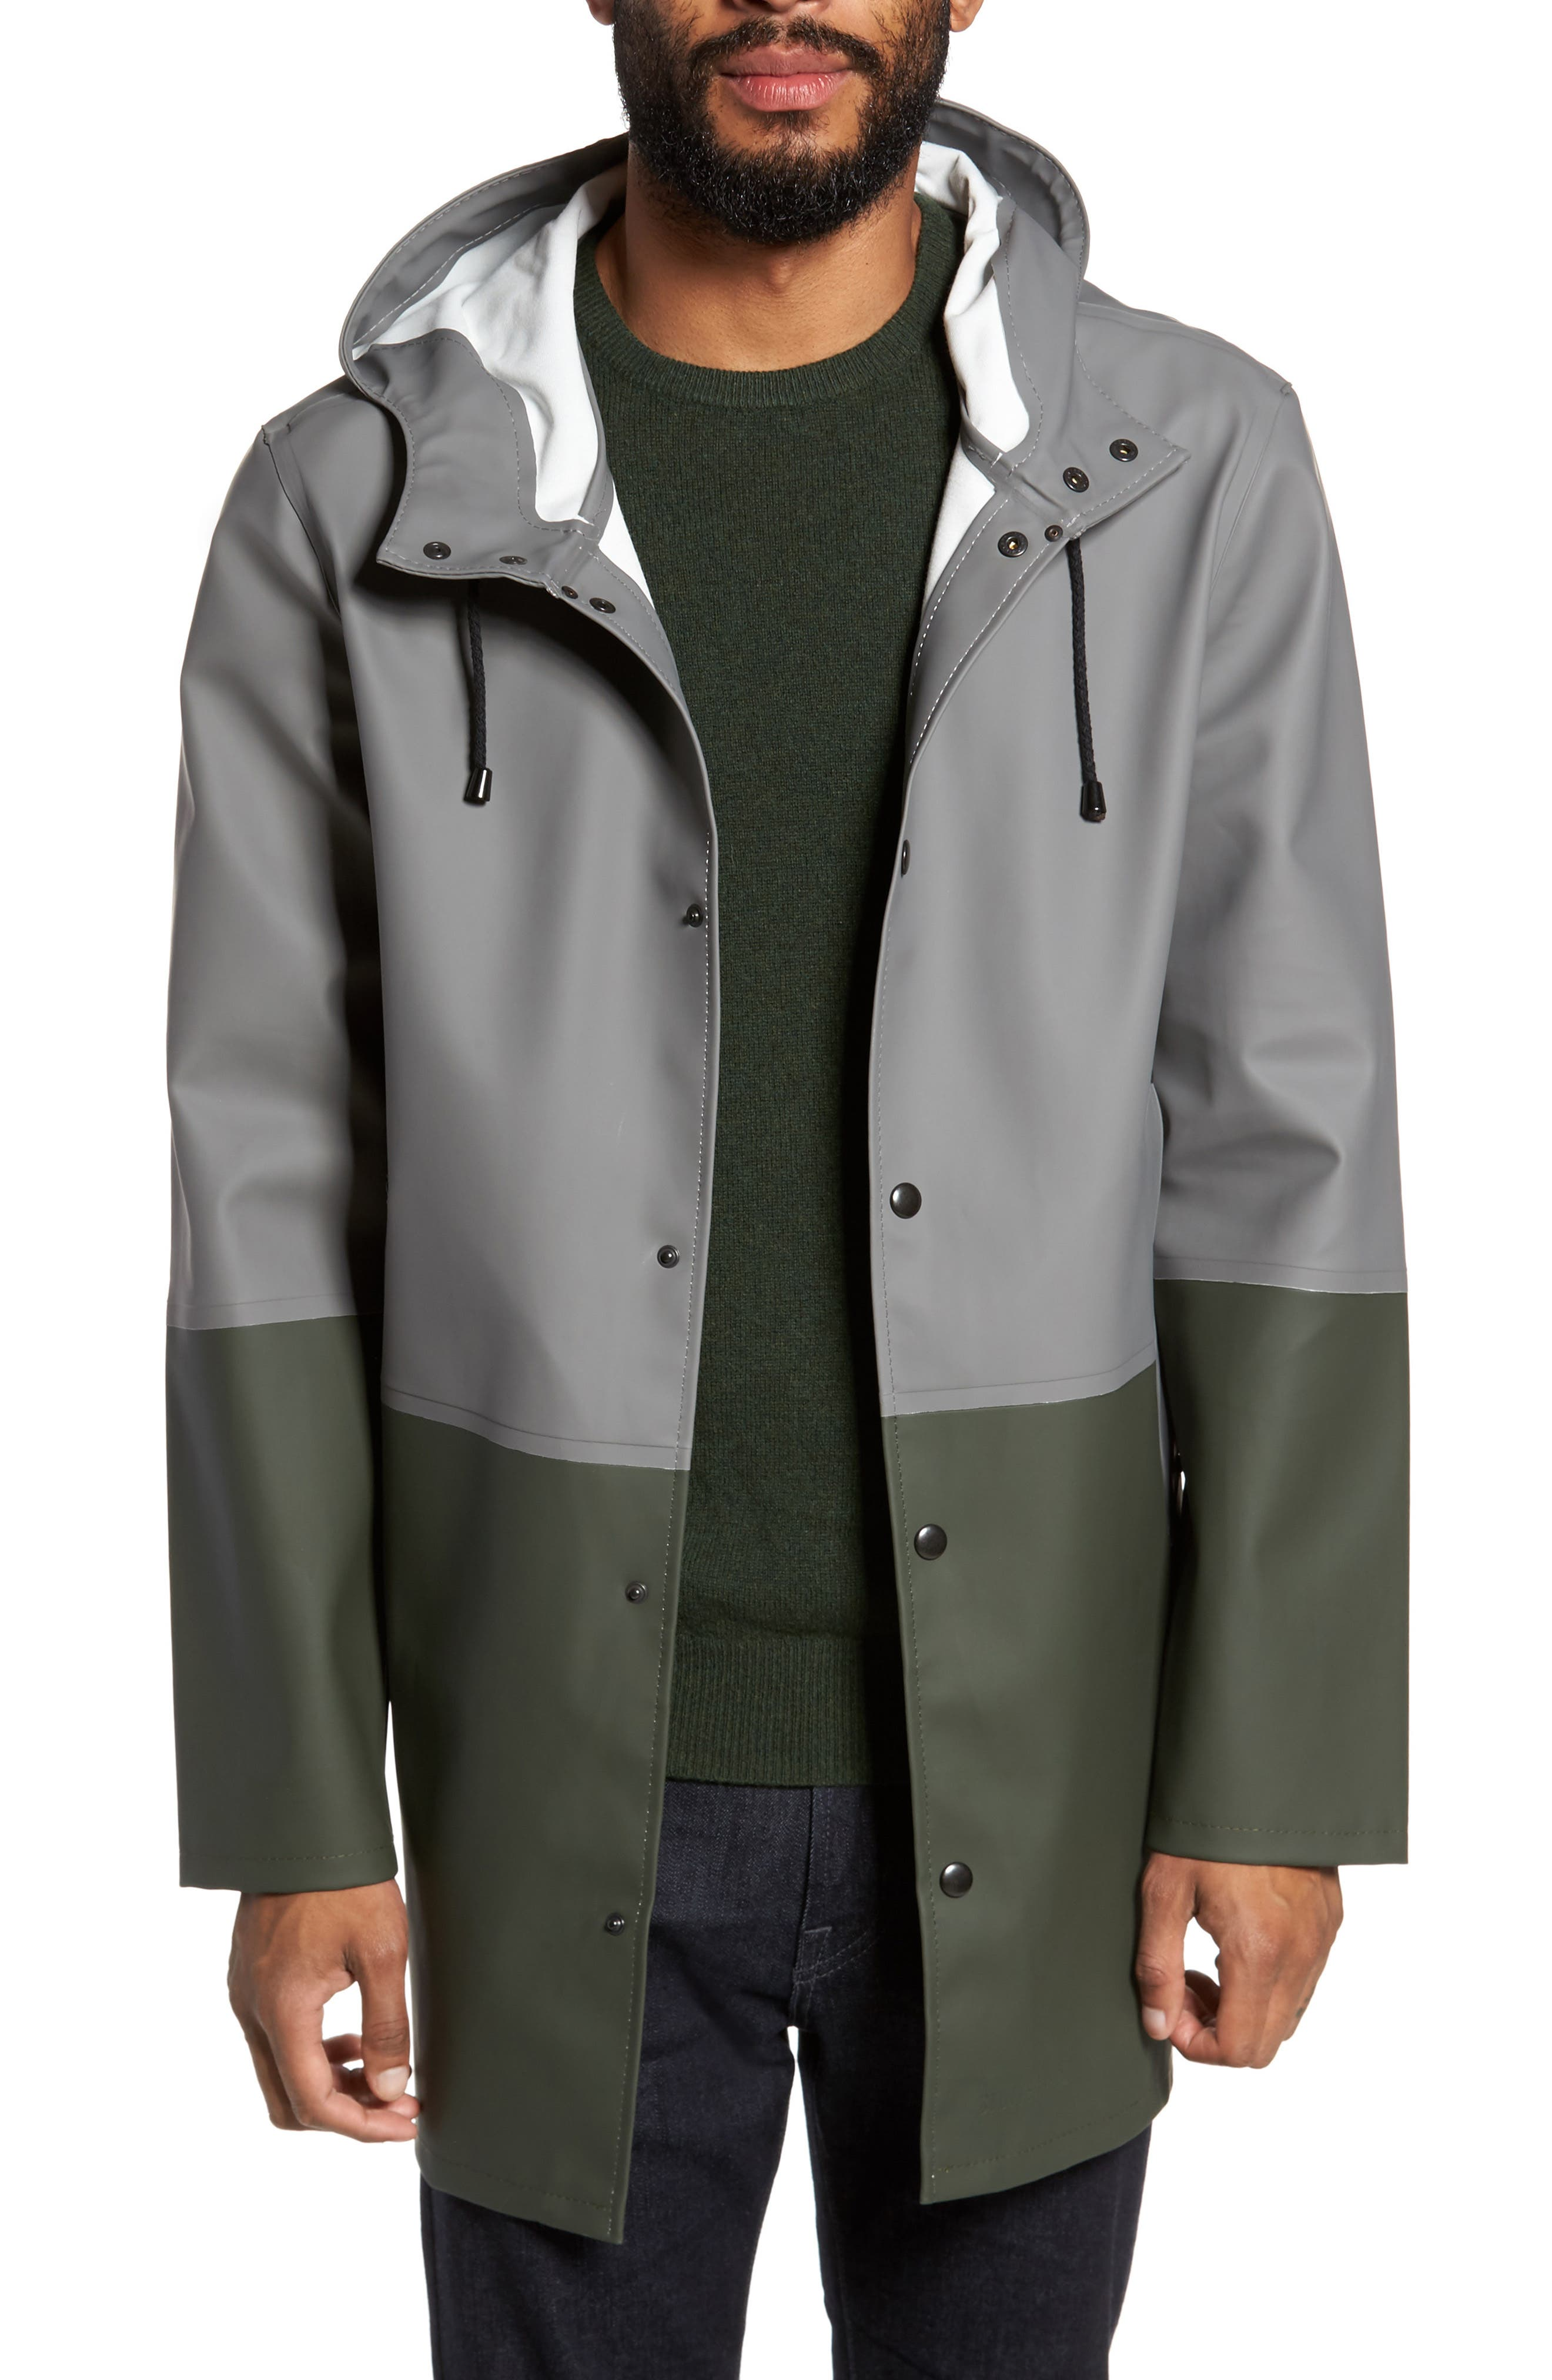 Stockholm Colorblock Waterproof Hooded Raincoat,                             Main thumbnail 1, color,                             Grey/ Green